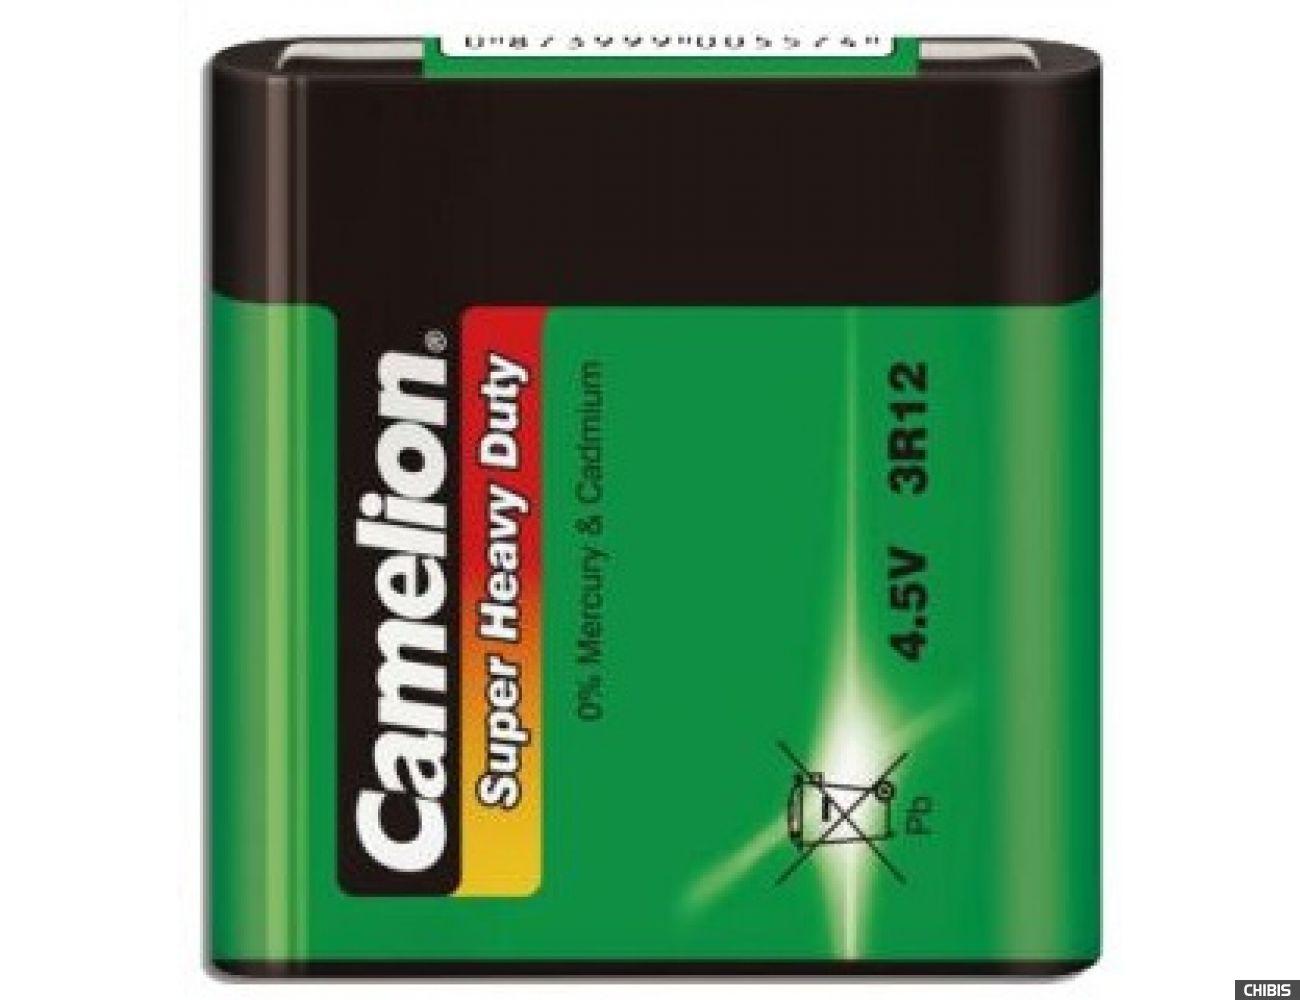 Батарейка Camelion 3R12 марганцево-цинковая 1/1 шт пленка